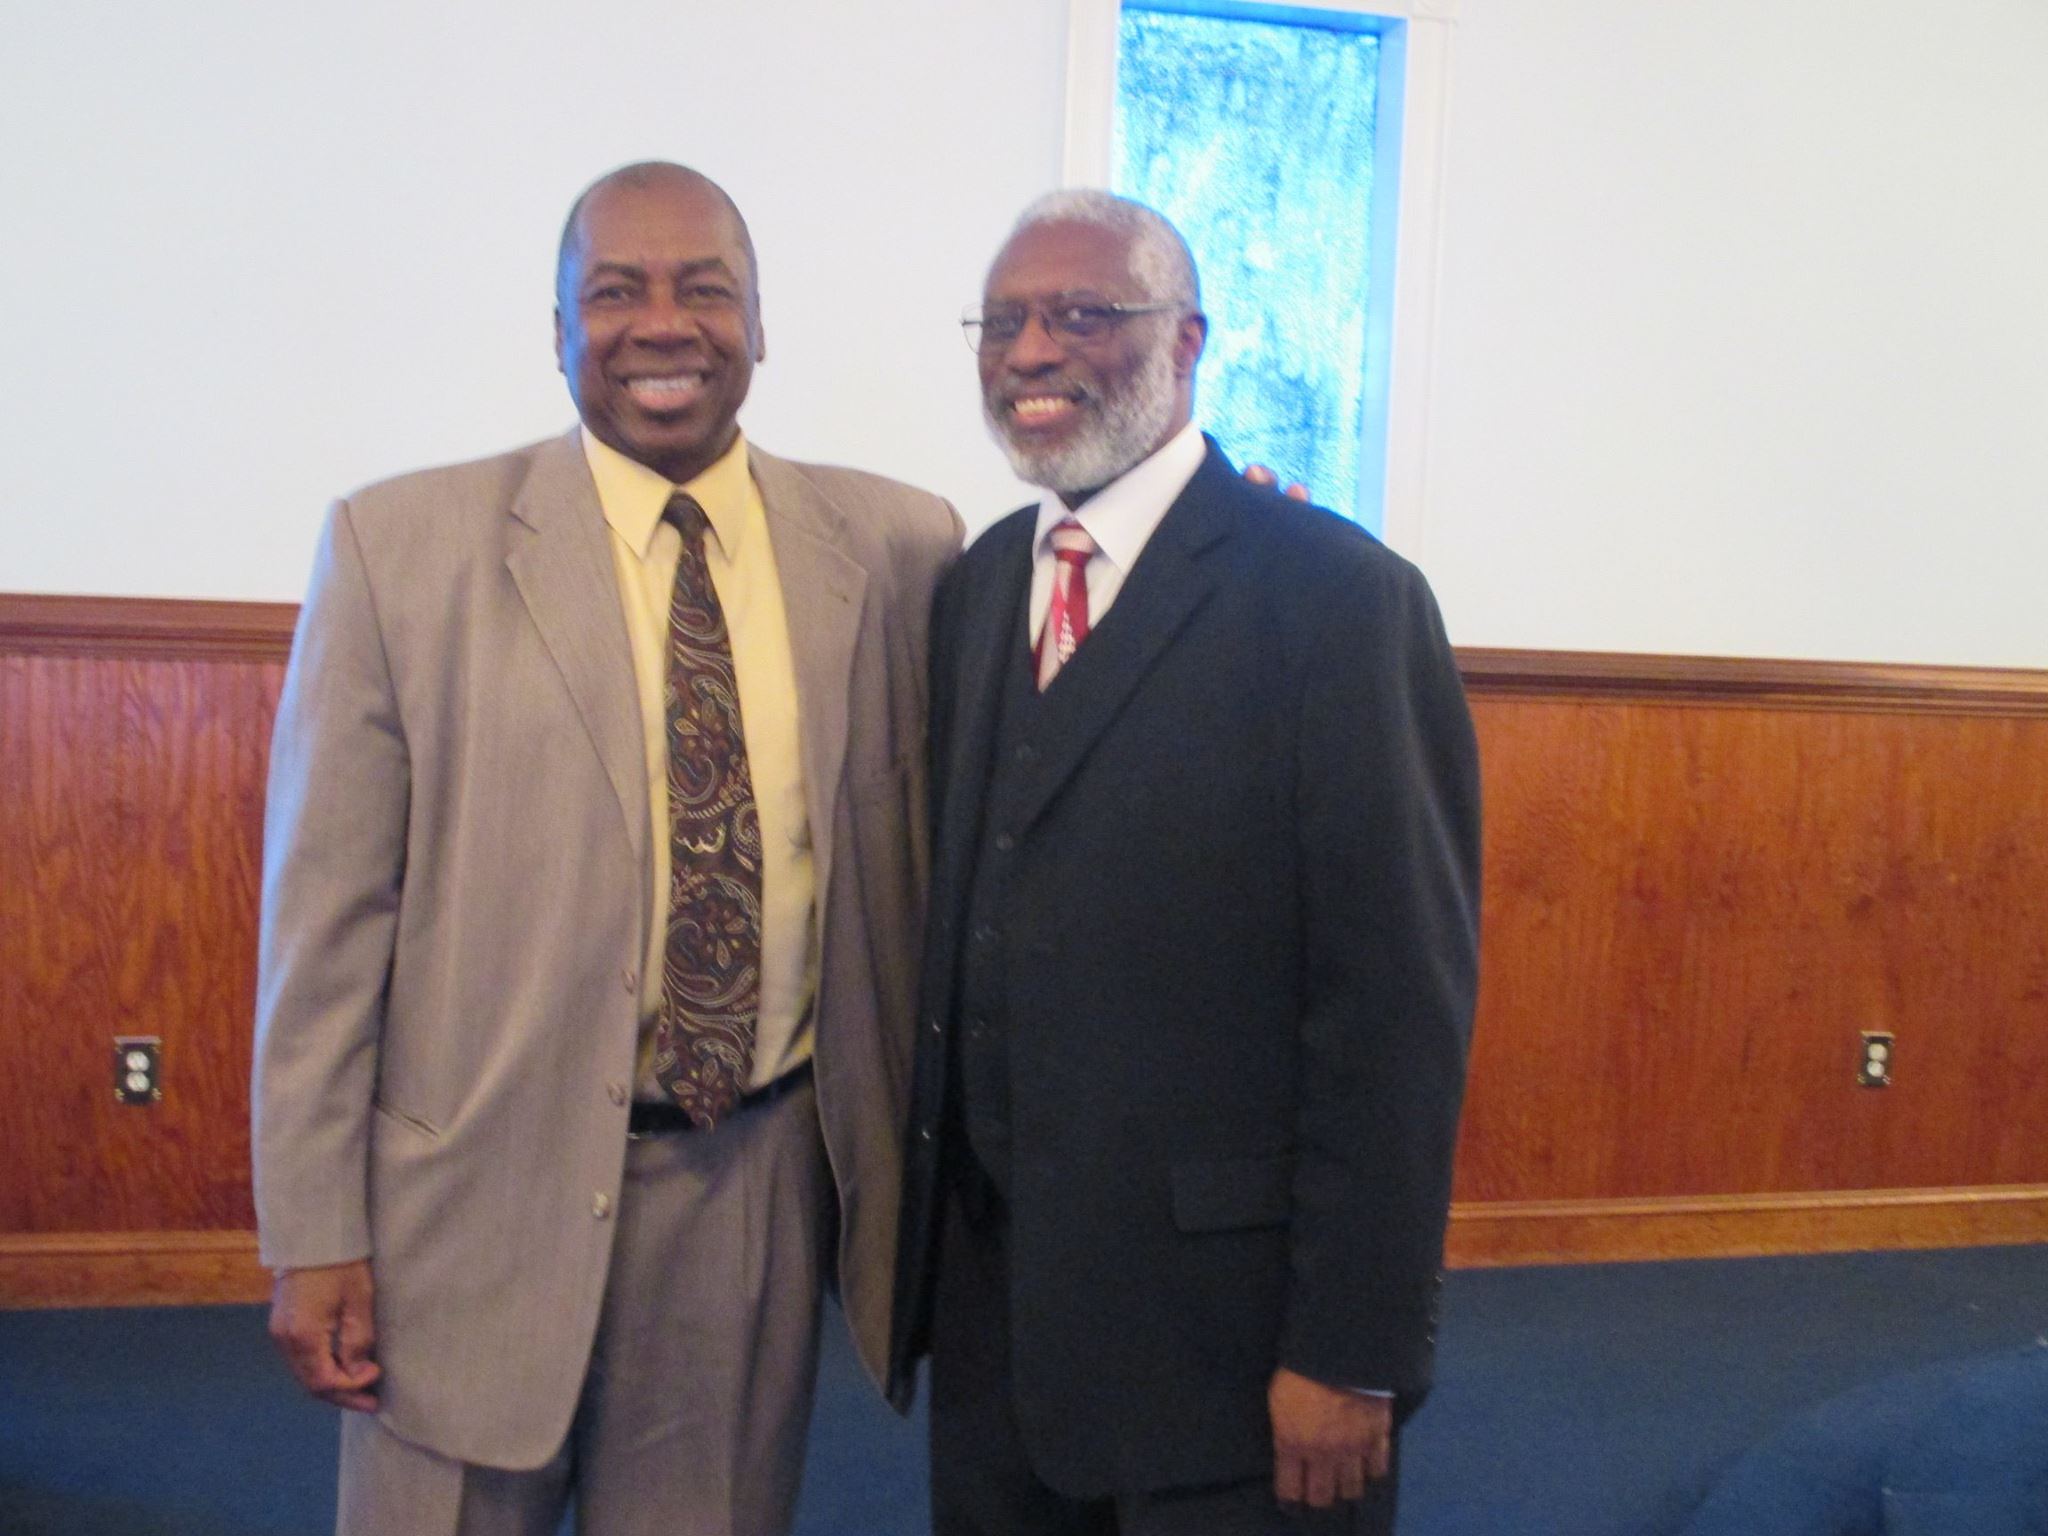 Pastor Joseph and J. Bishop Knox